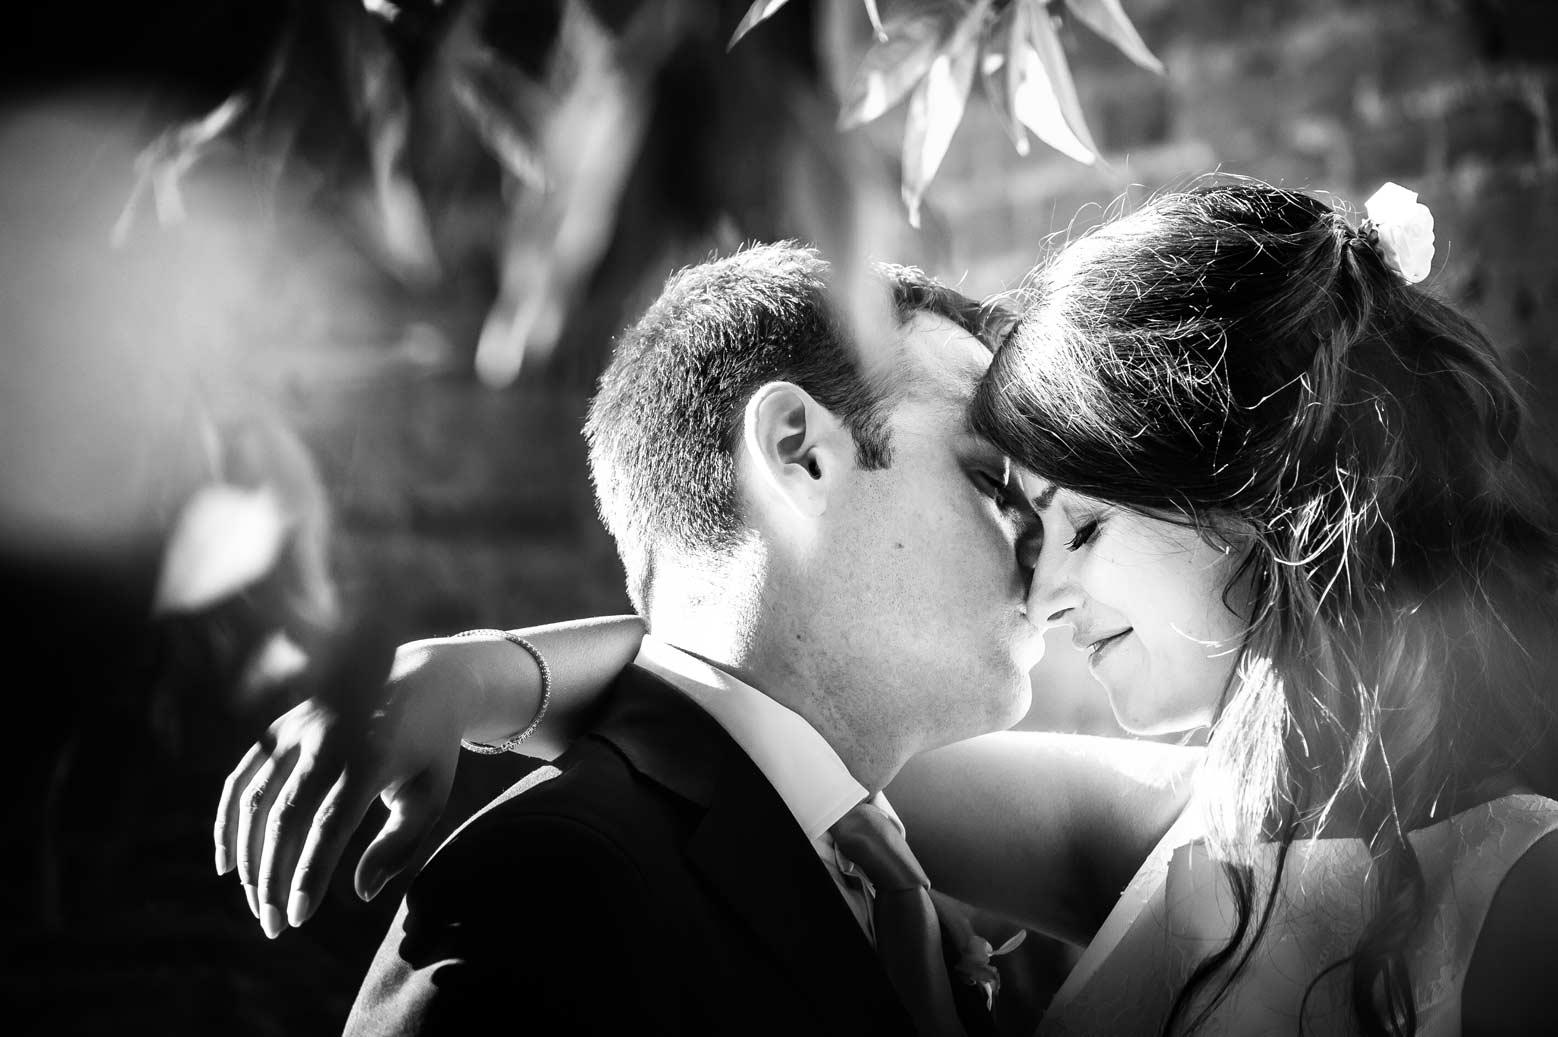 Reportage-Wedding-Photographer-Portraits